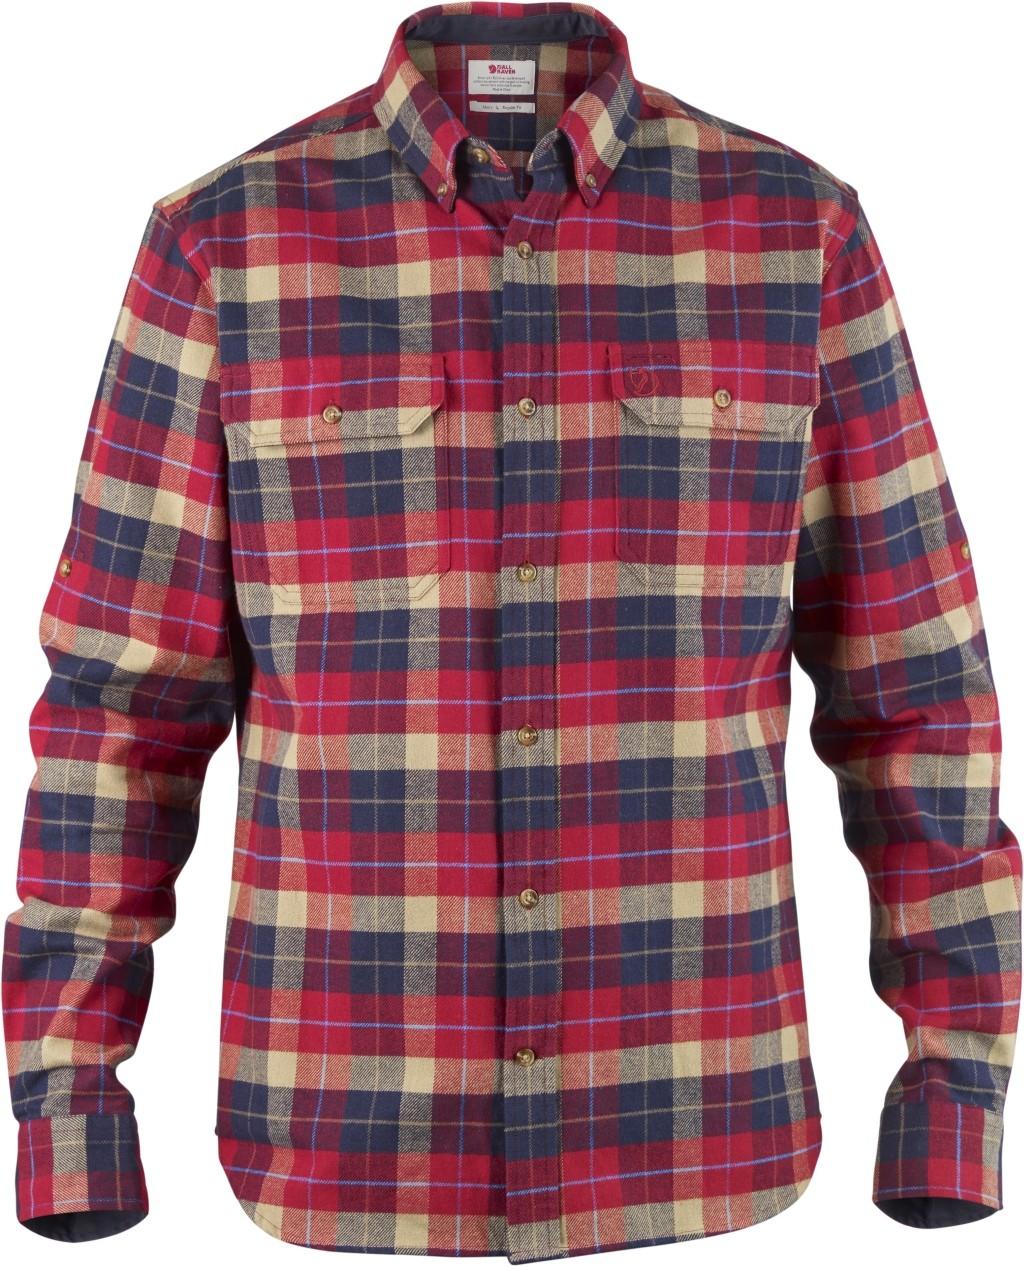 FjallRaven Sarek Heavy Flannel Shirt